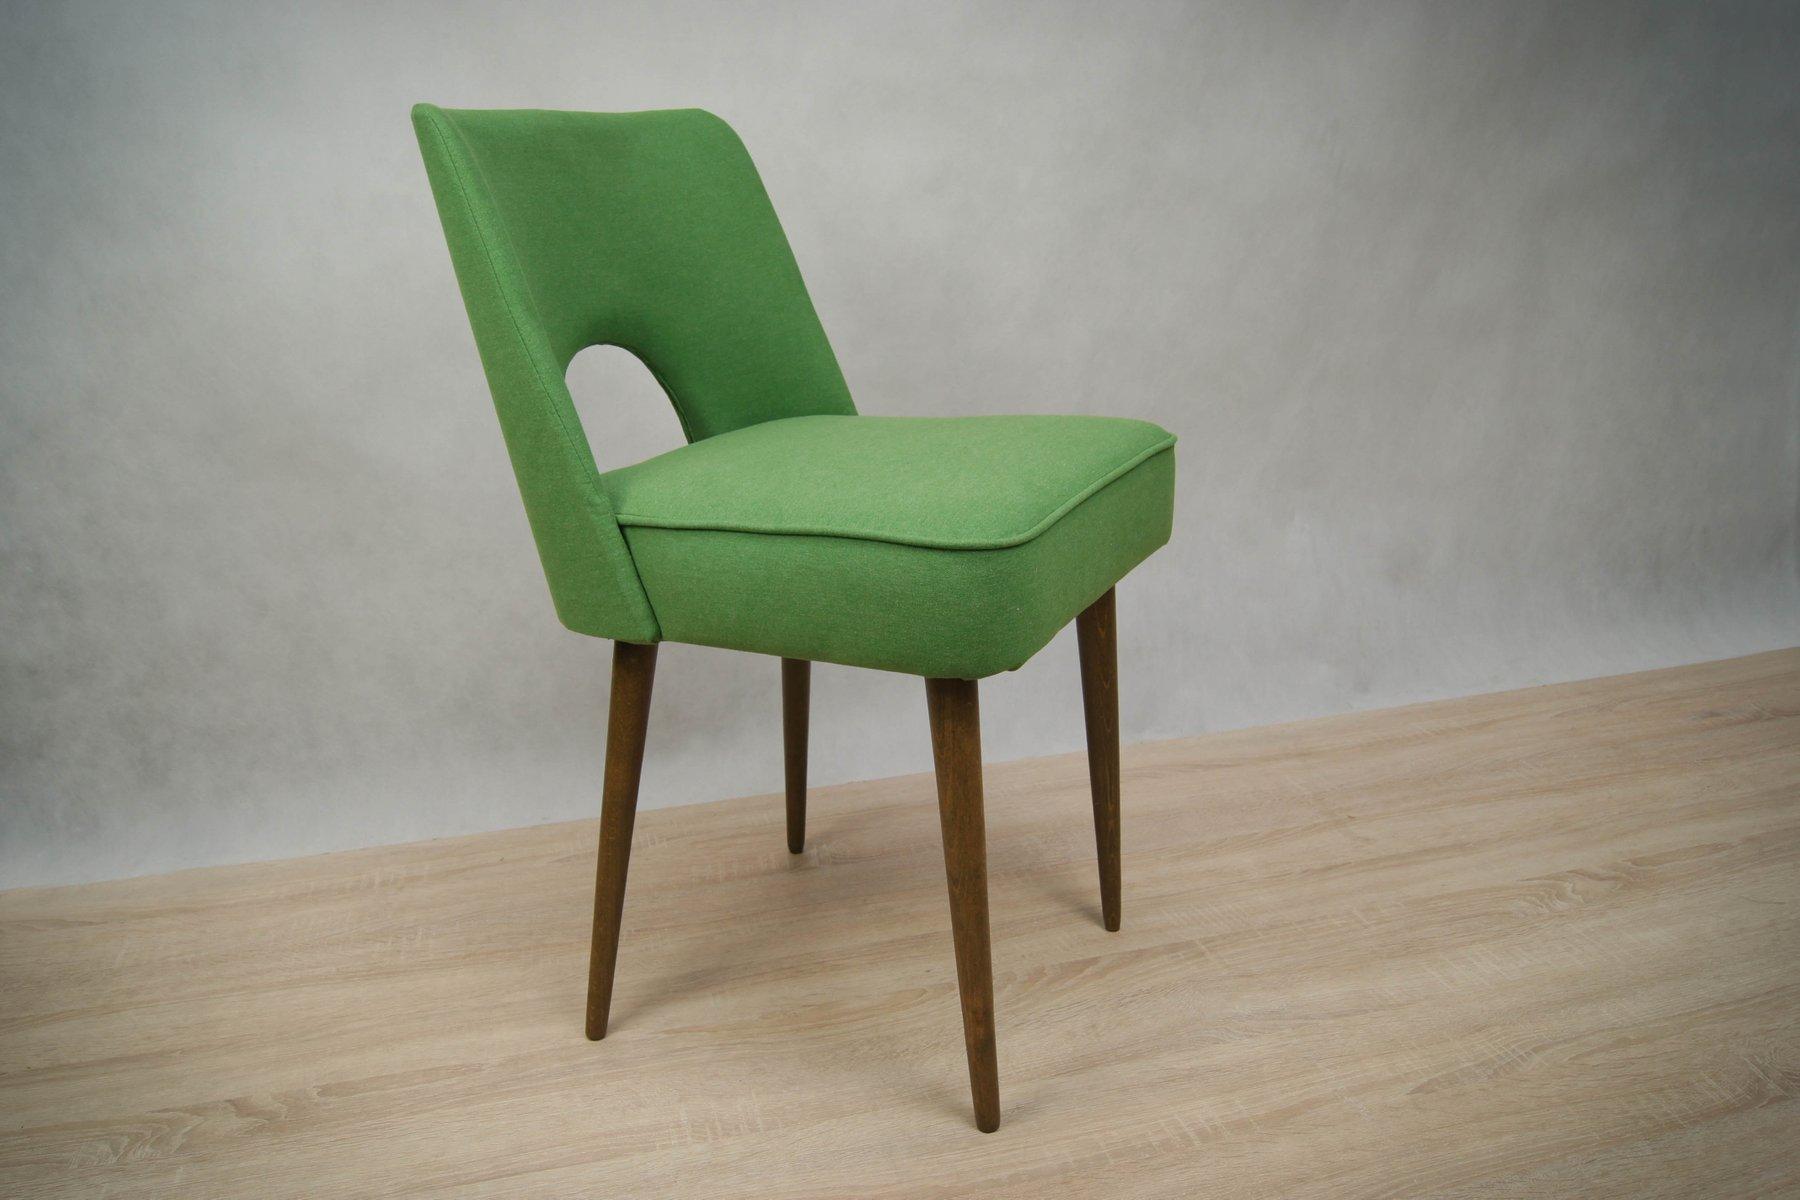 polnische muschel st hle 1960er 4er set bei pamono kaufen. Black Bedroom Furniture Sets. Home Design Ideas